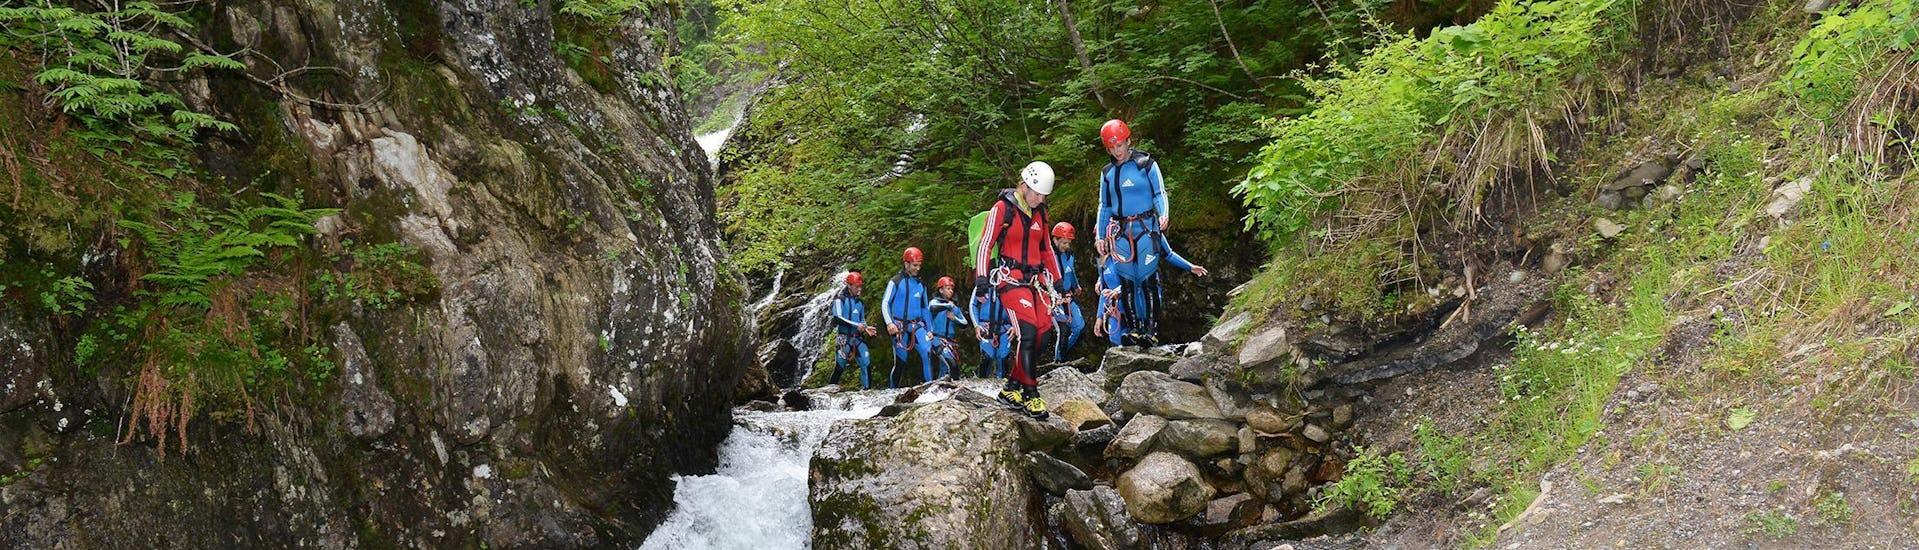 canyoning-king-of-the-alps---alpenrosenklamm-faszinatour-hero